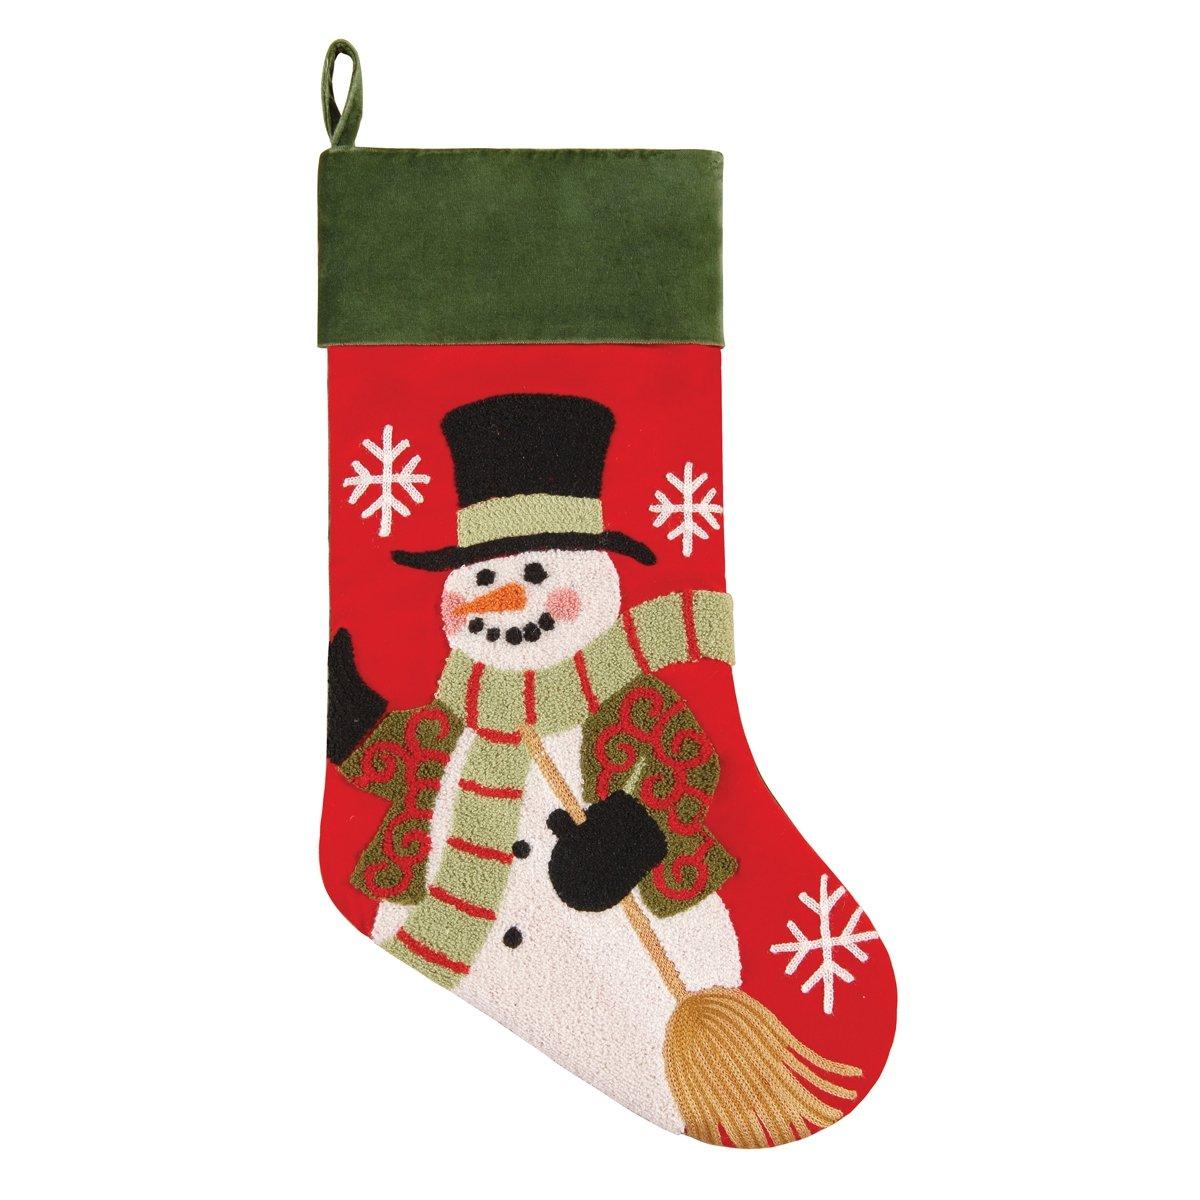 C&F Home Snowman Christmas Tufted Stocking Multi